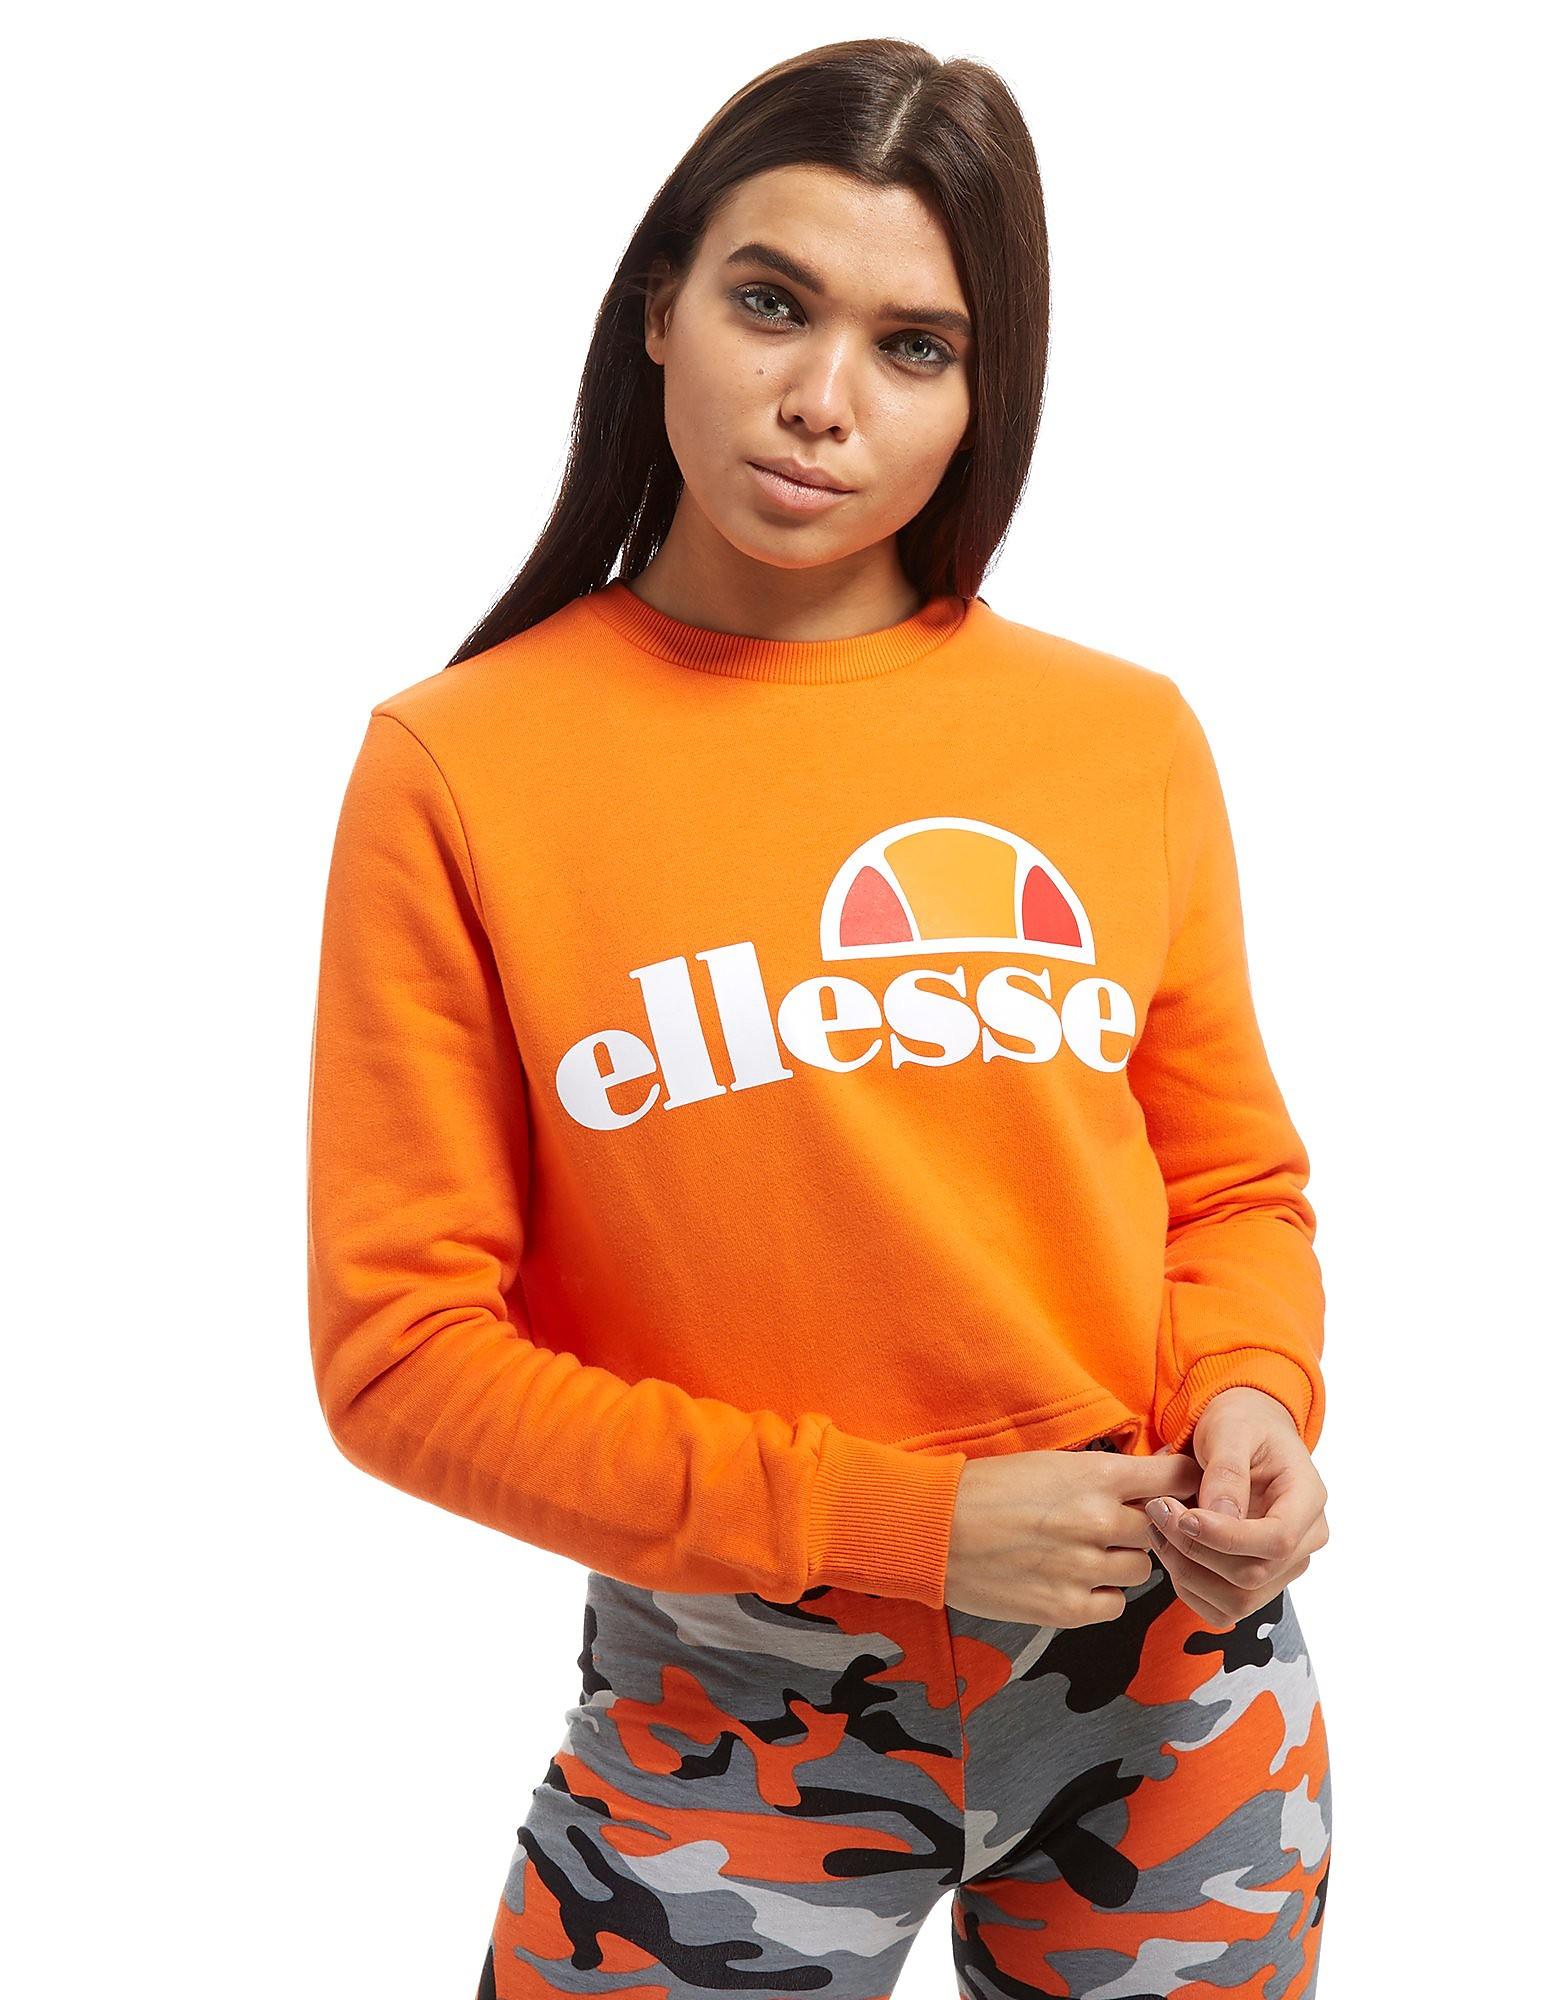 Ellesse Logo Cropped Crew Sweatshirt